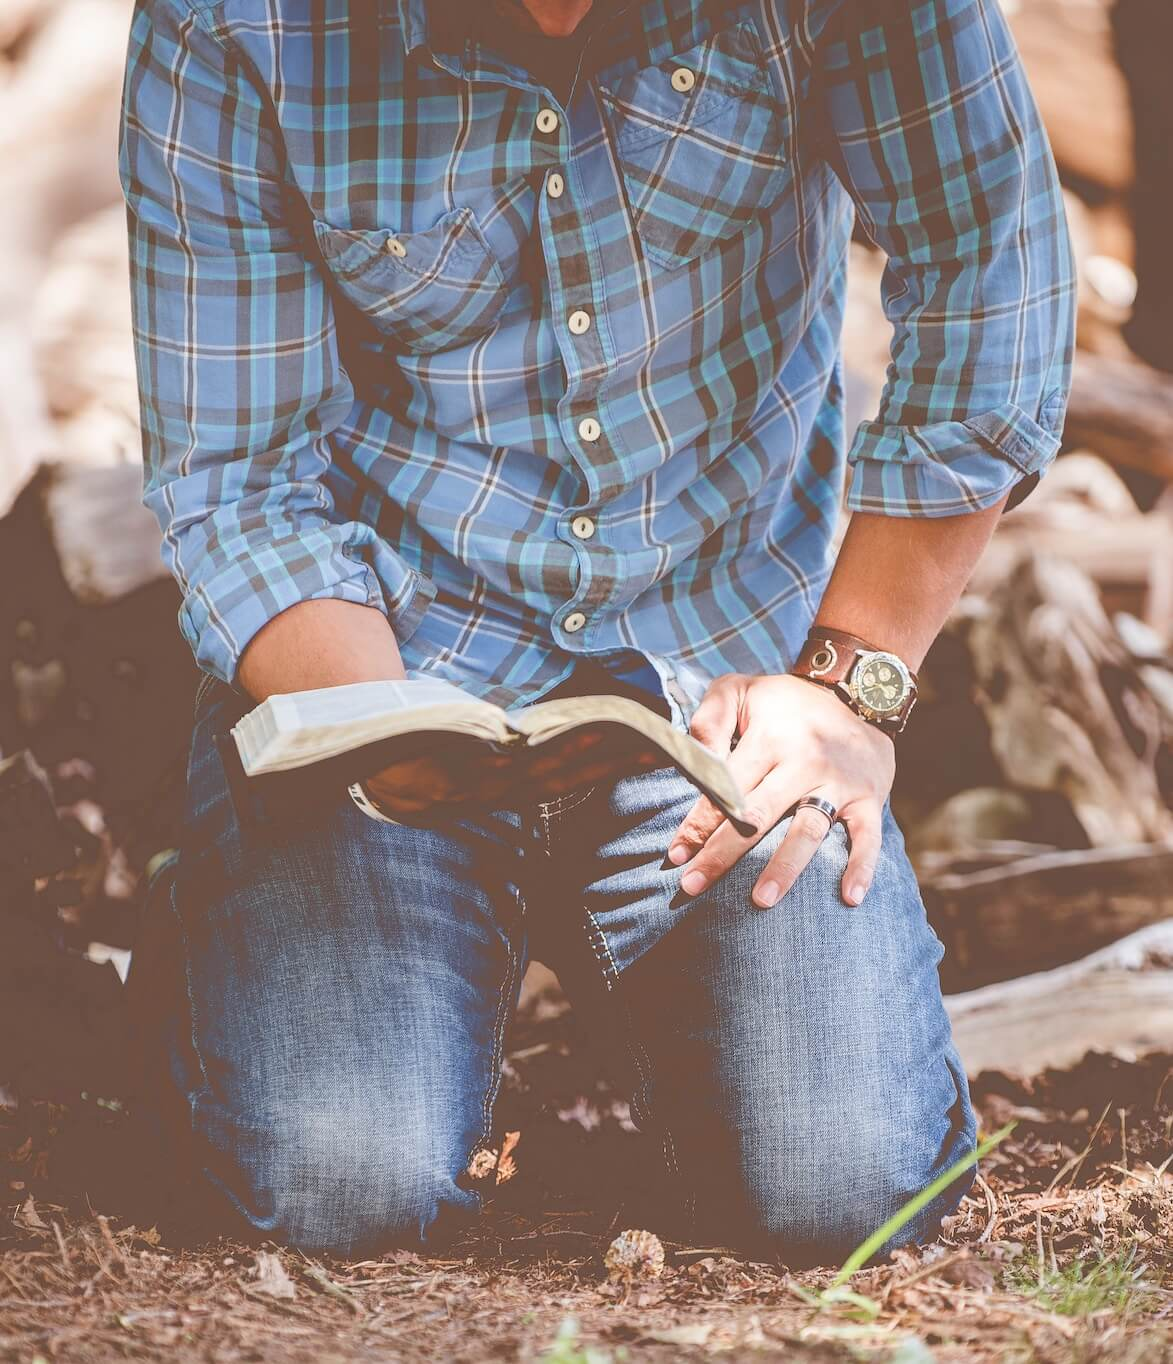 6 Qualities Successful Leaders Cultivate - Spiritual